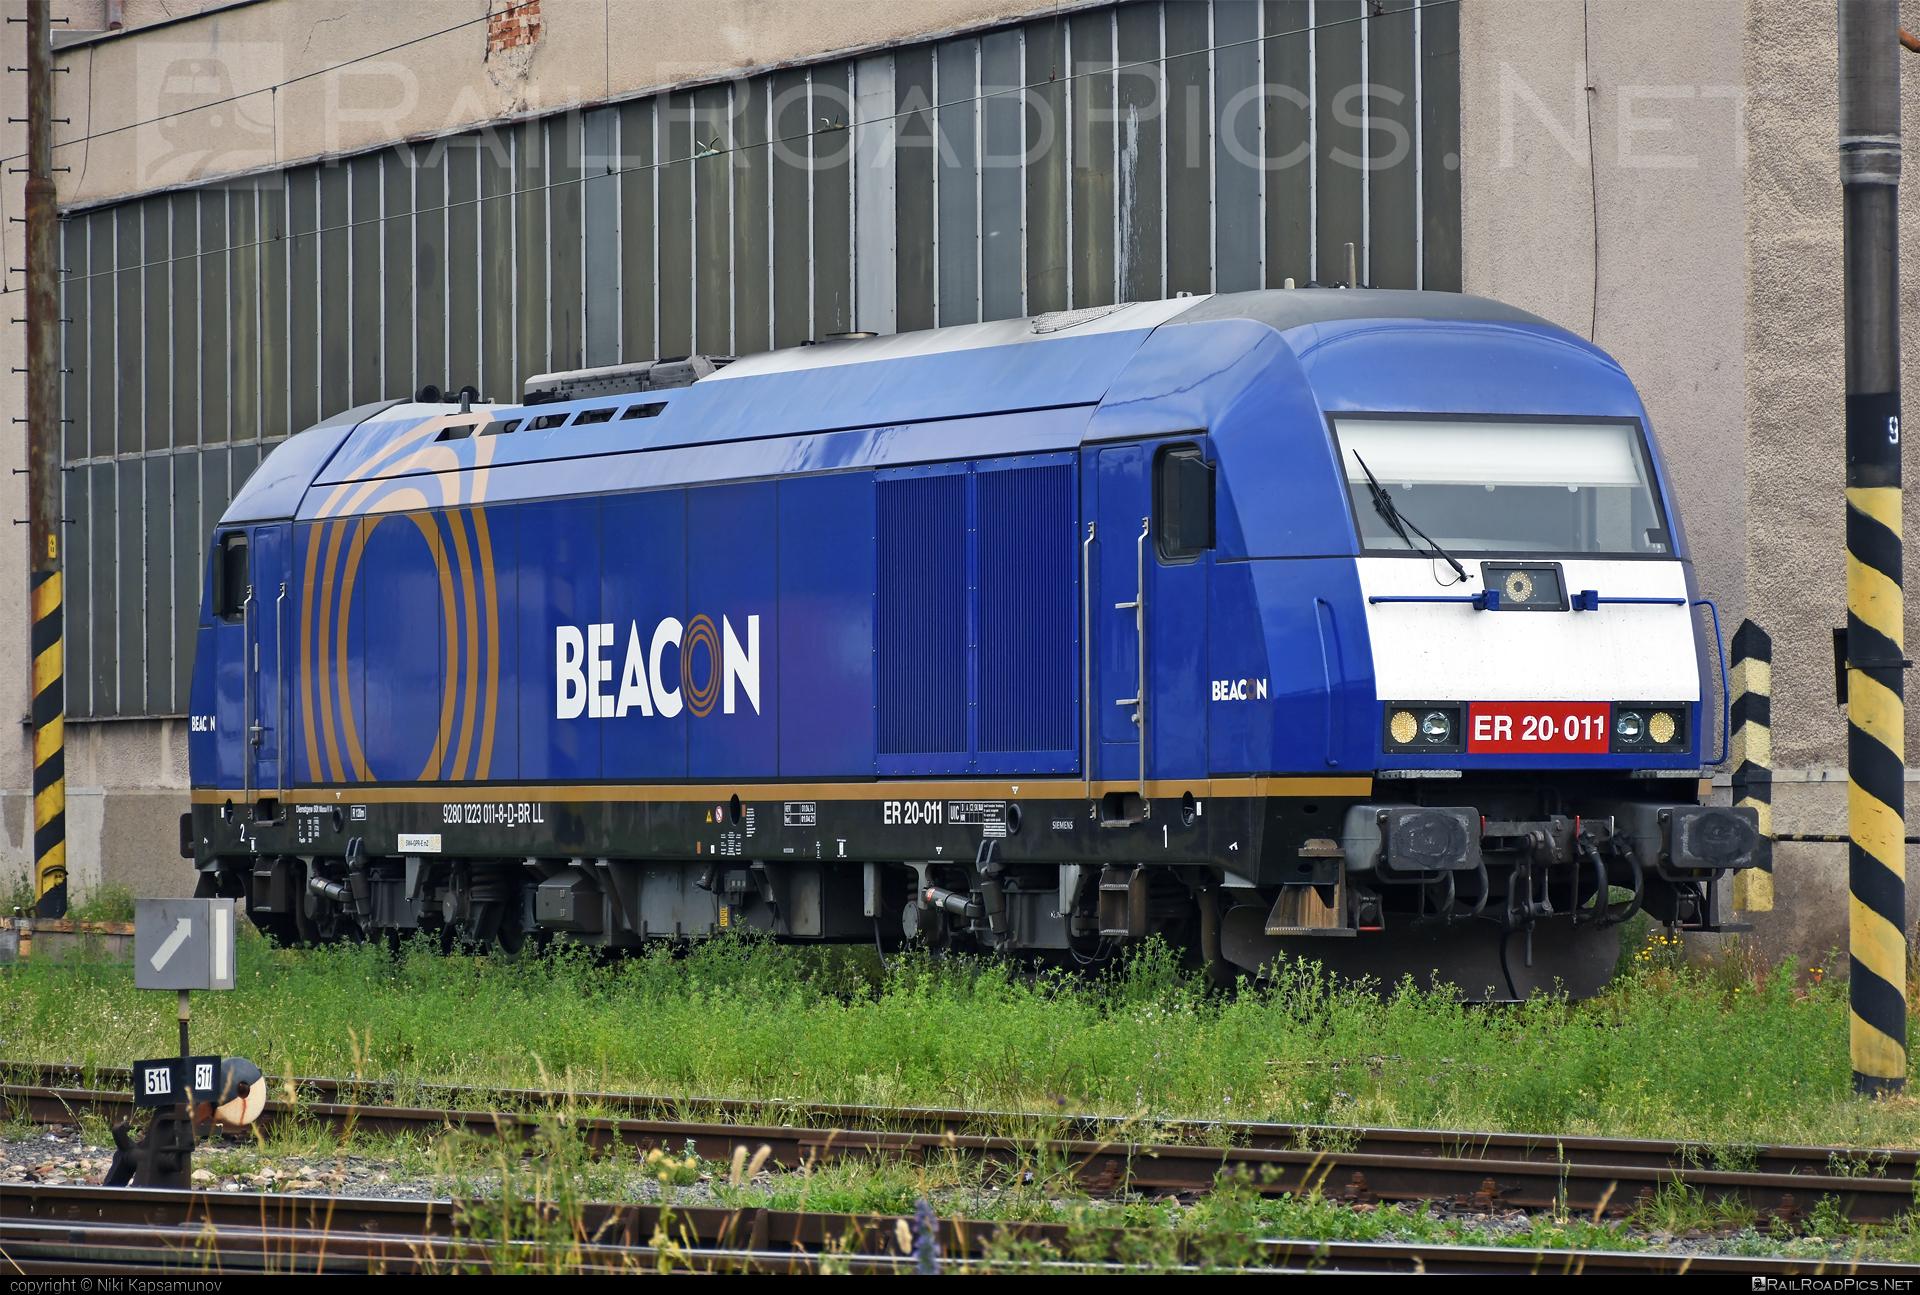 Siemens ER20 - 223 011-8 operated by Retrack Slovakia s. r. o. #beaconrailleasing #beaconrailleasinglimited #brll #er20 #er20hercules #eurorunner #hercules #retrackslovakia #siemens #siemenser20 #siemenser20hercules #siemenseurorunner #siemenshercules